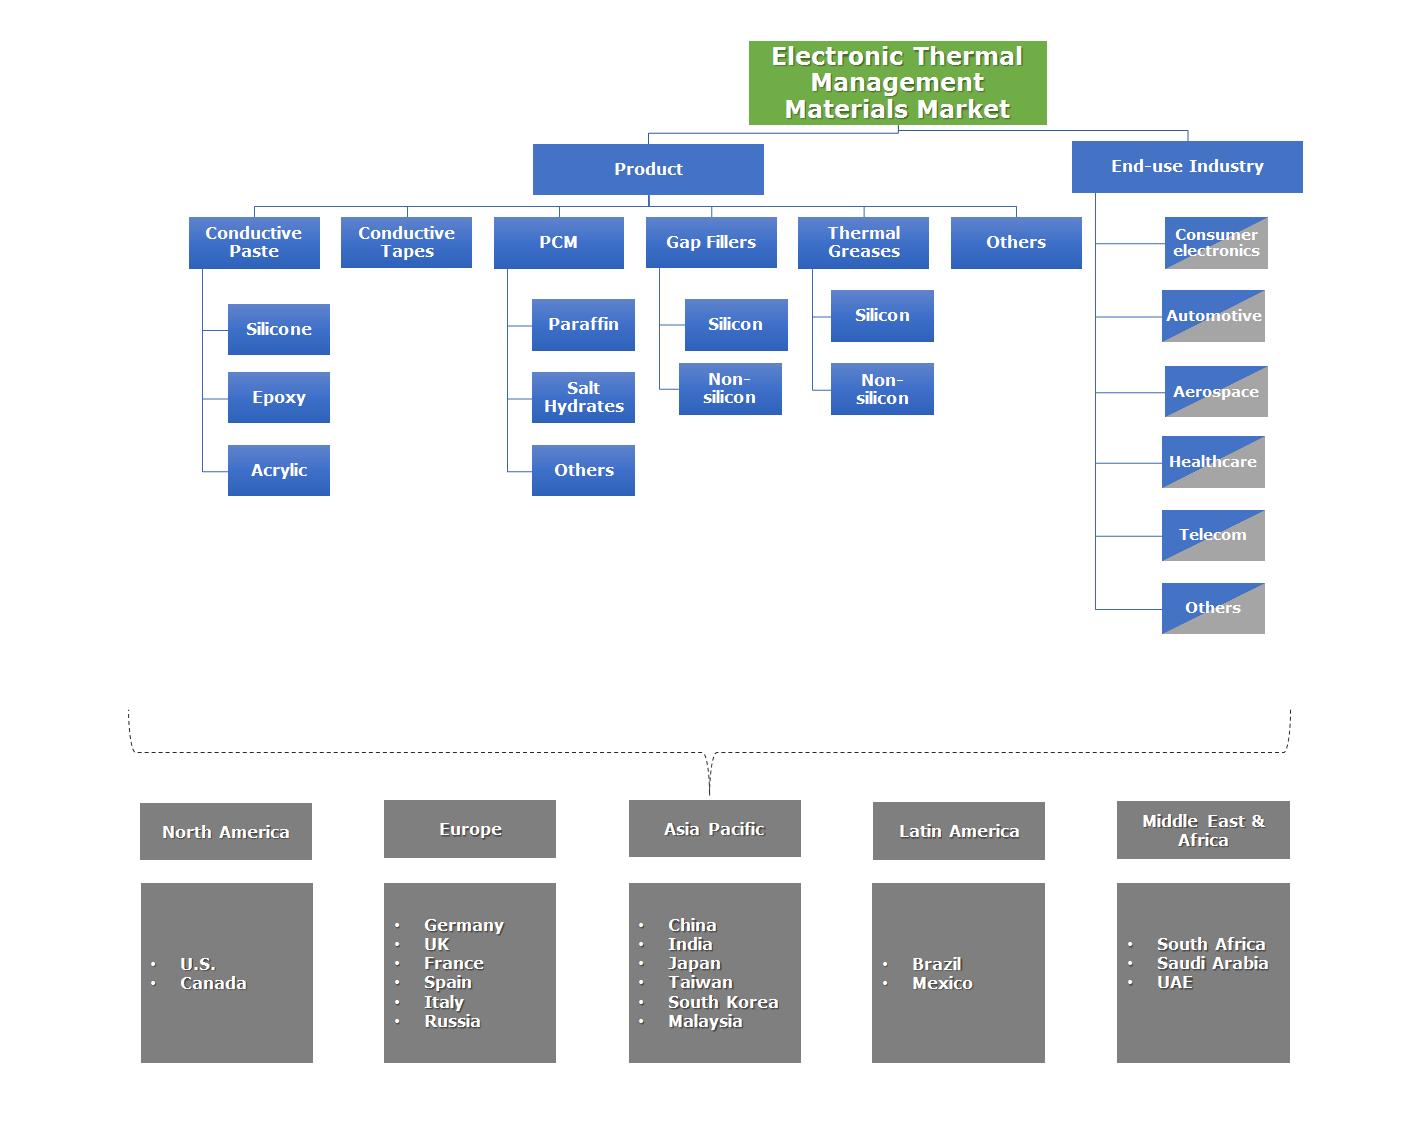 Electronic Thermal Management Materials Market Segmentation